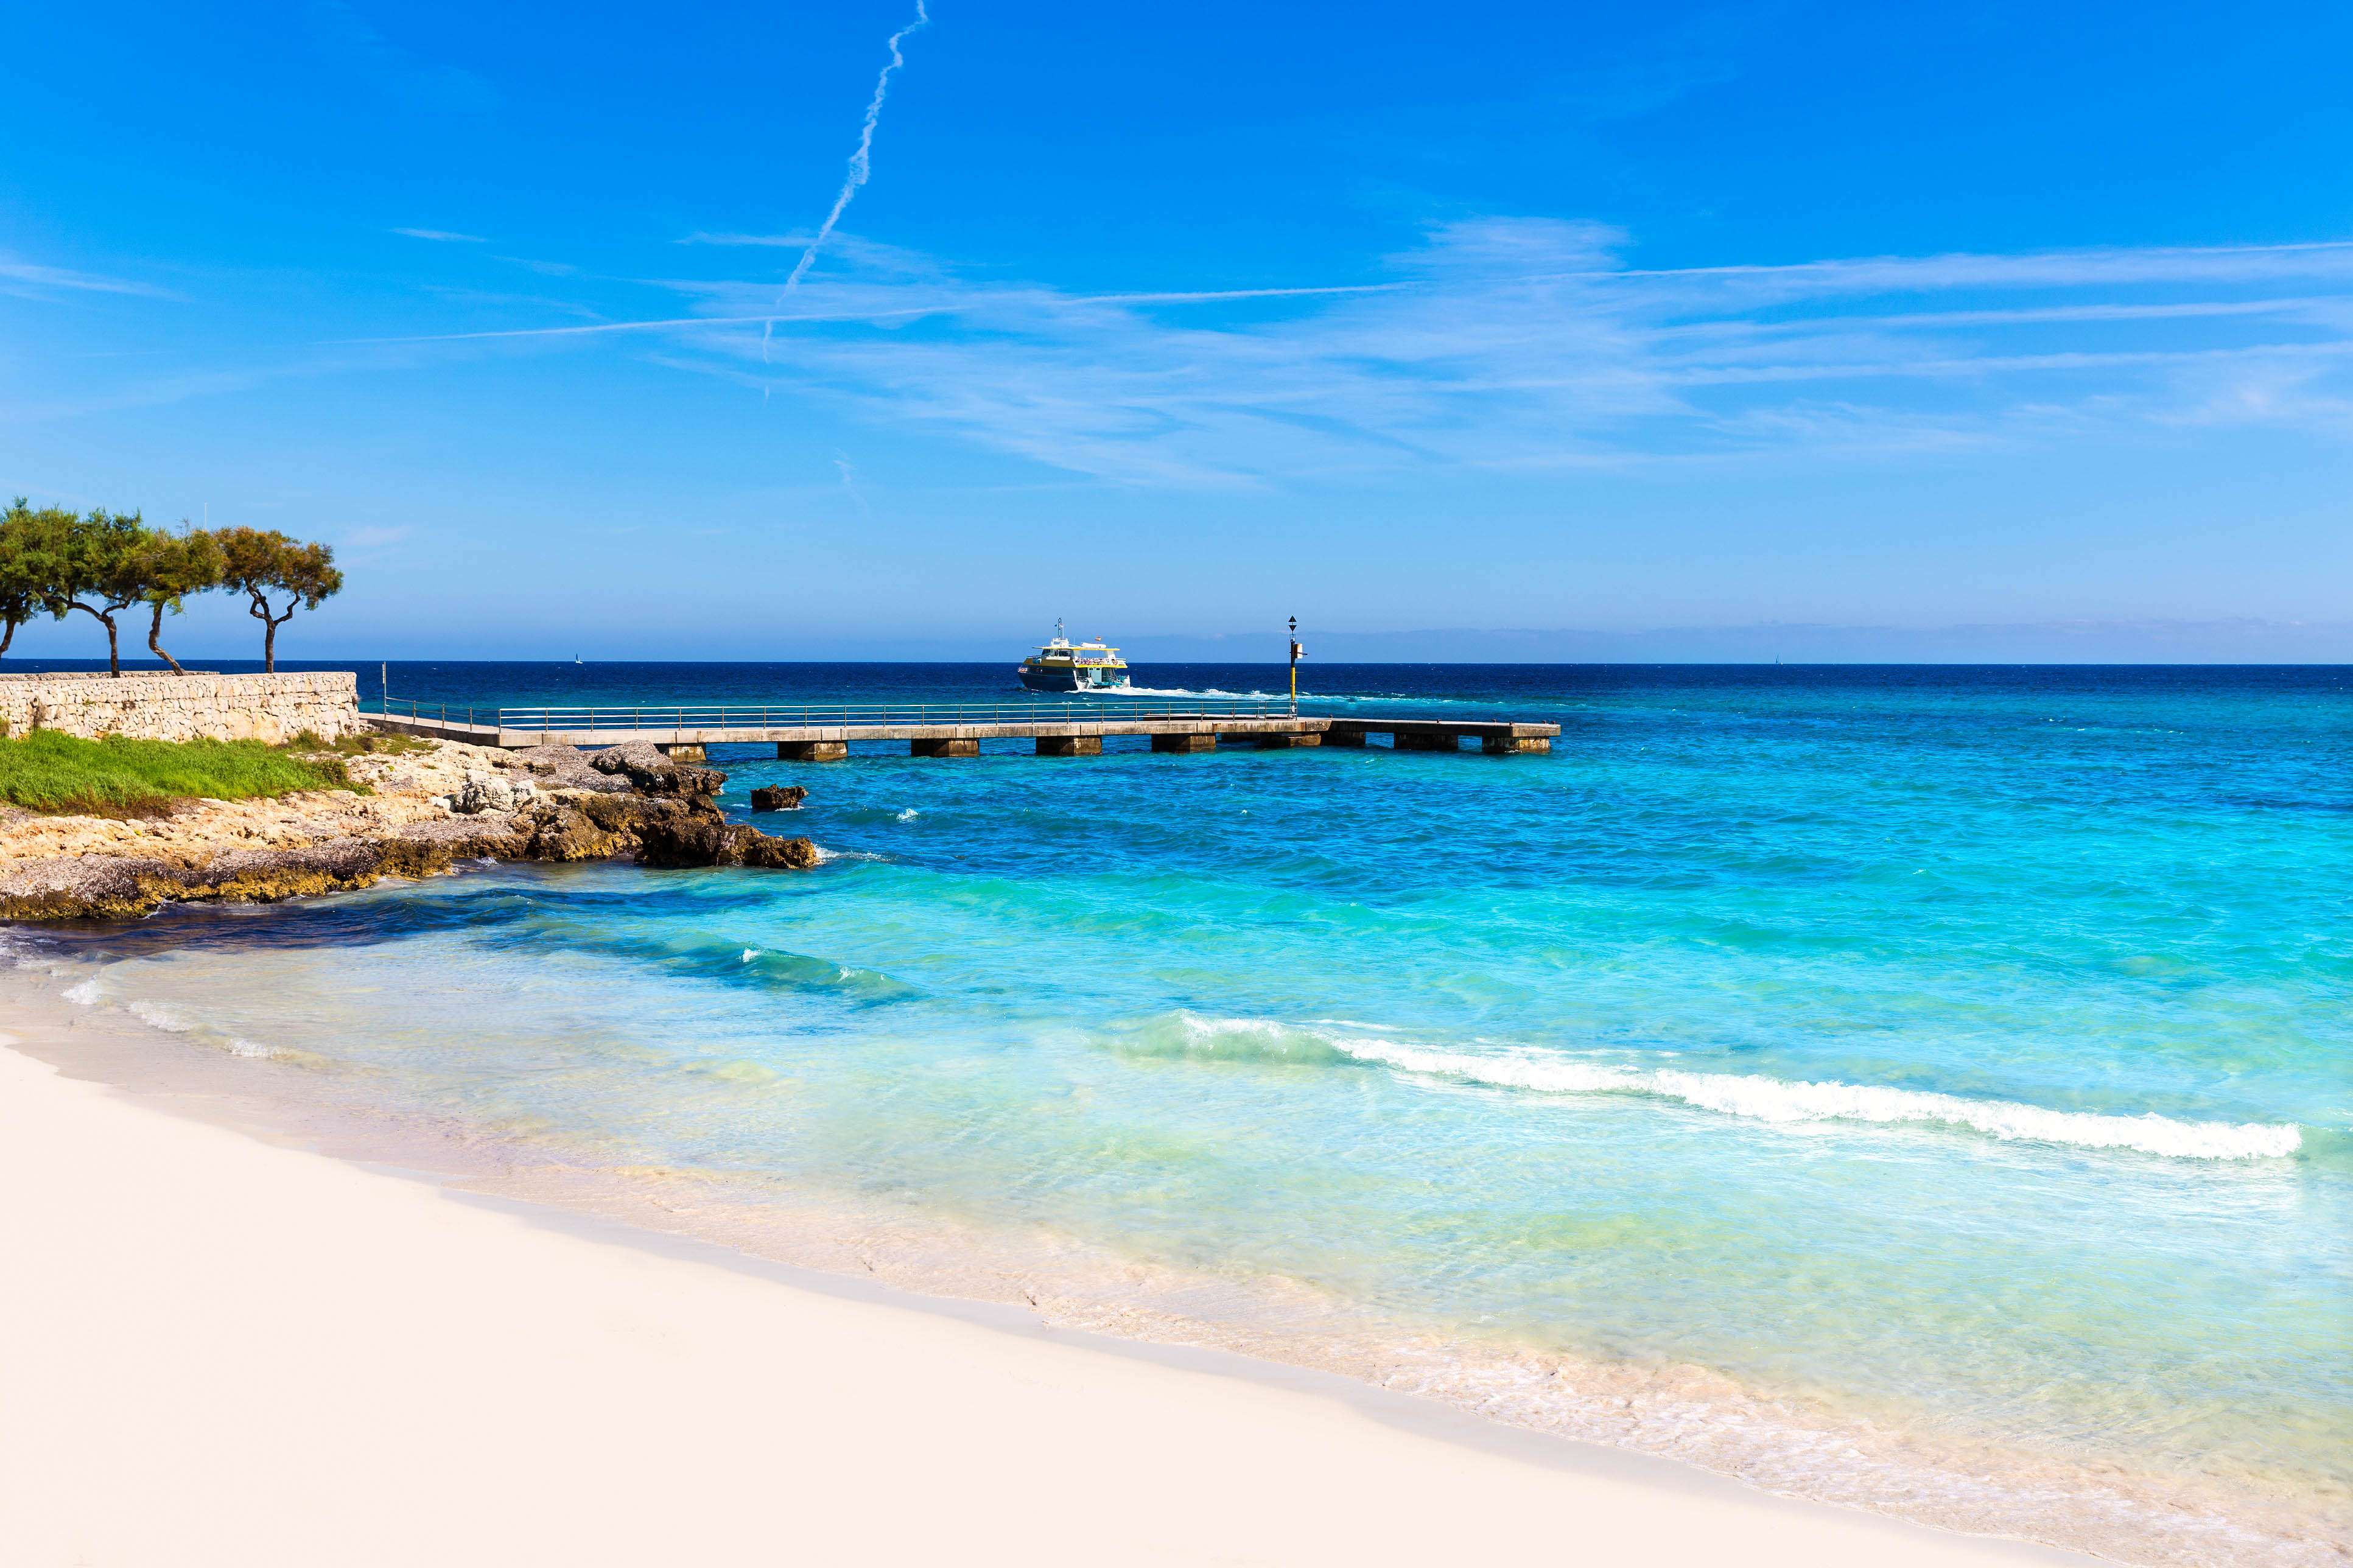 Vakantie op mallorca in uitstekend hotel for Design hotel mallorca strand